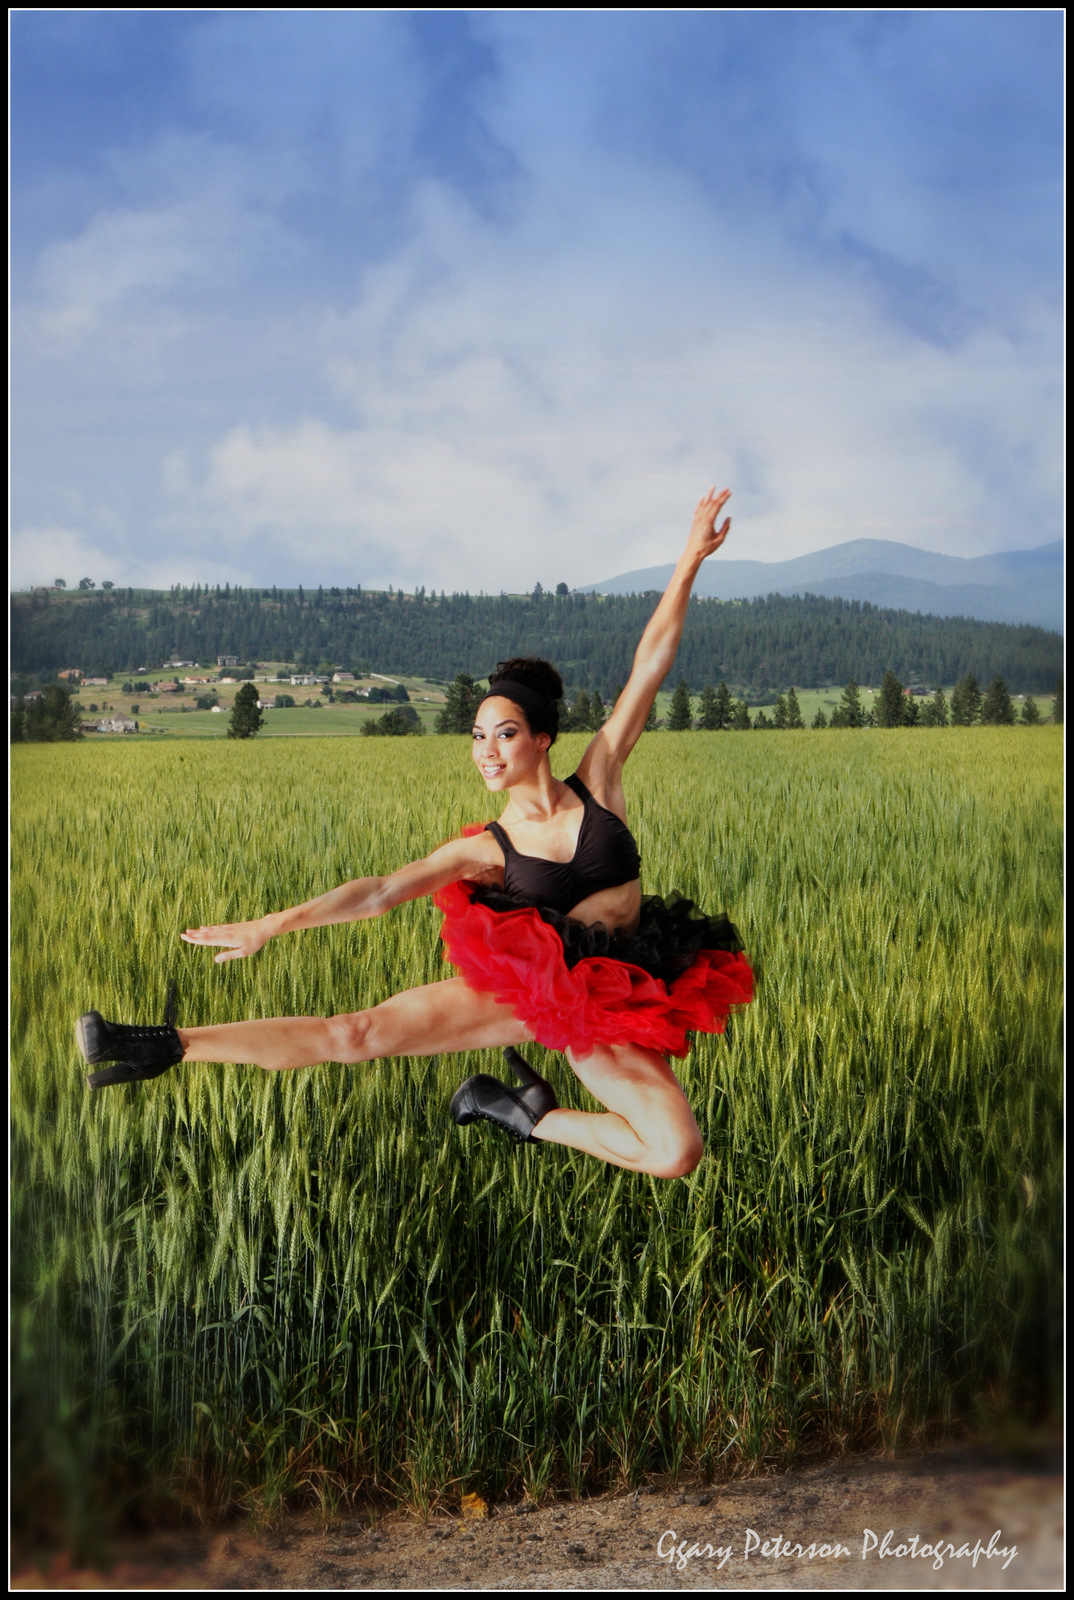 023-01-1-Leesha Ballet Field .jpg